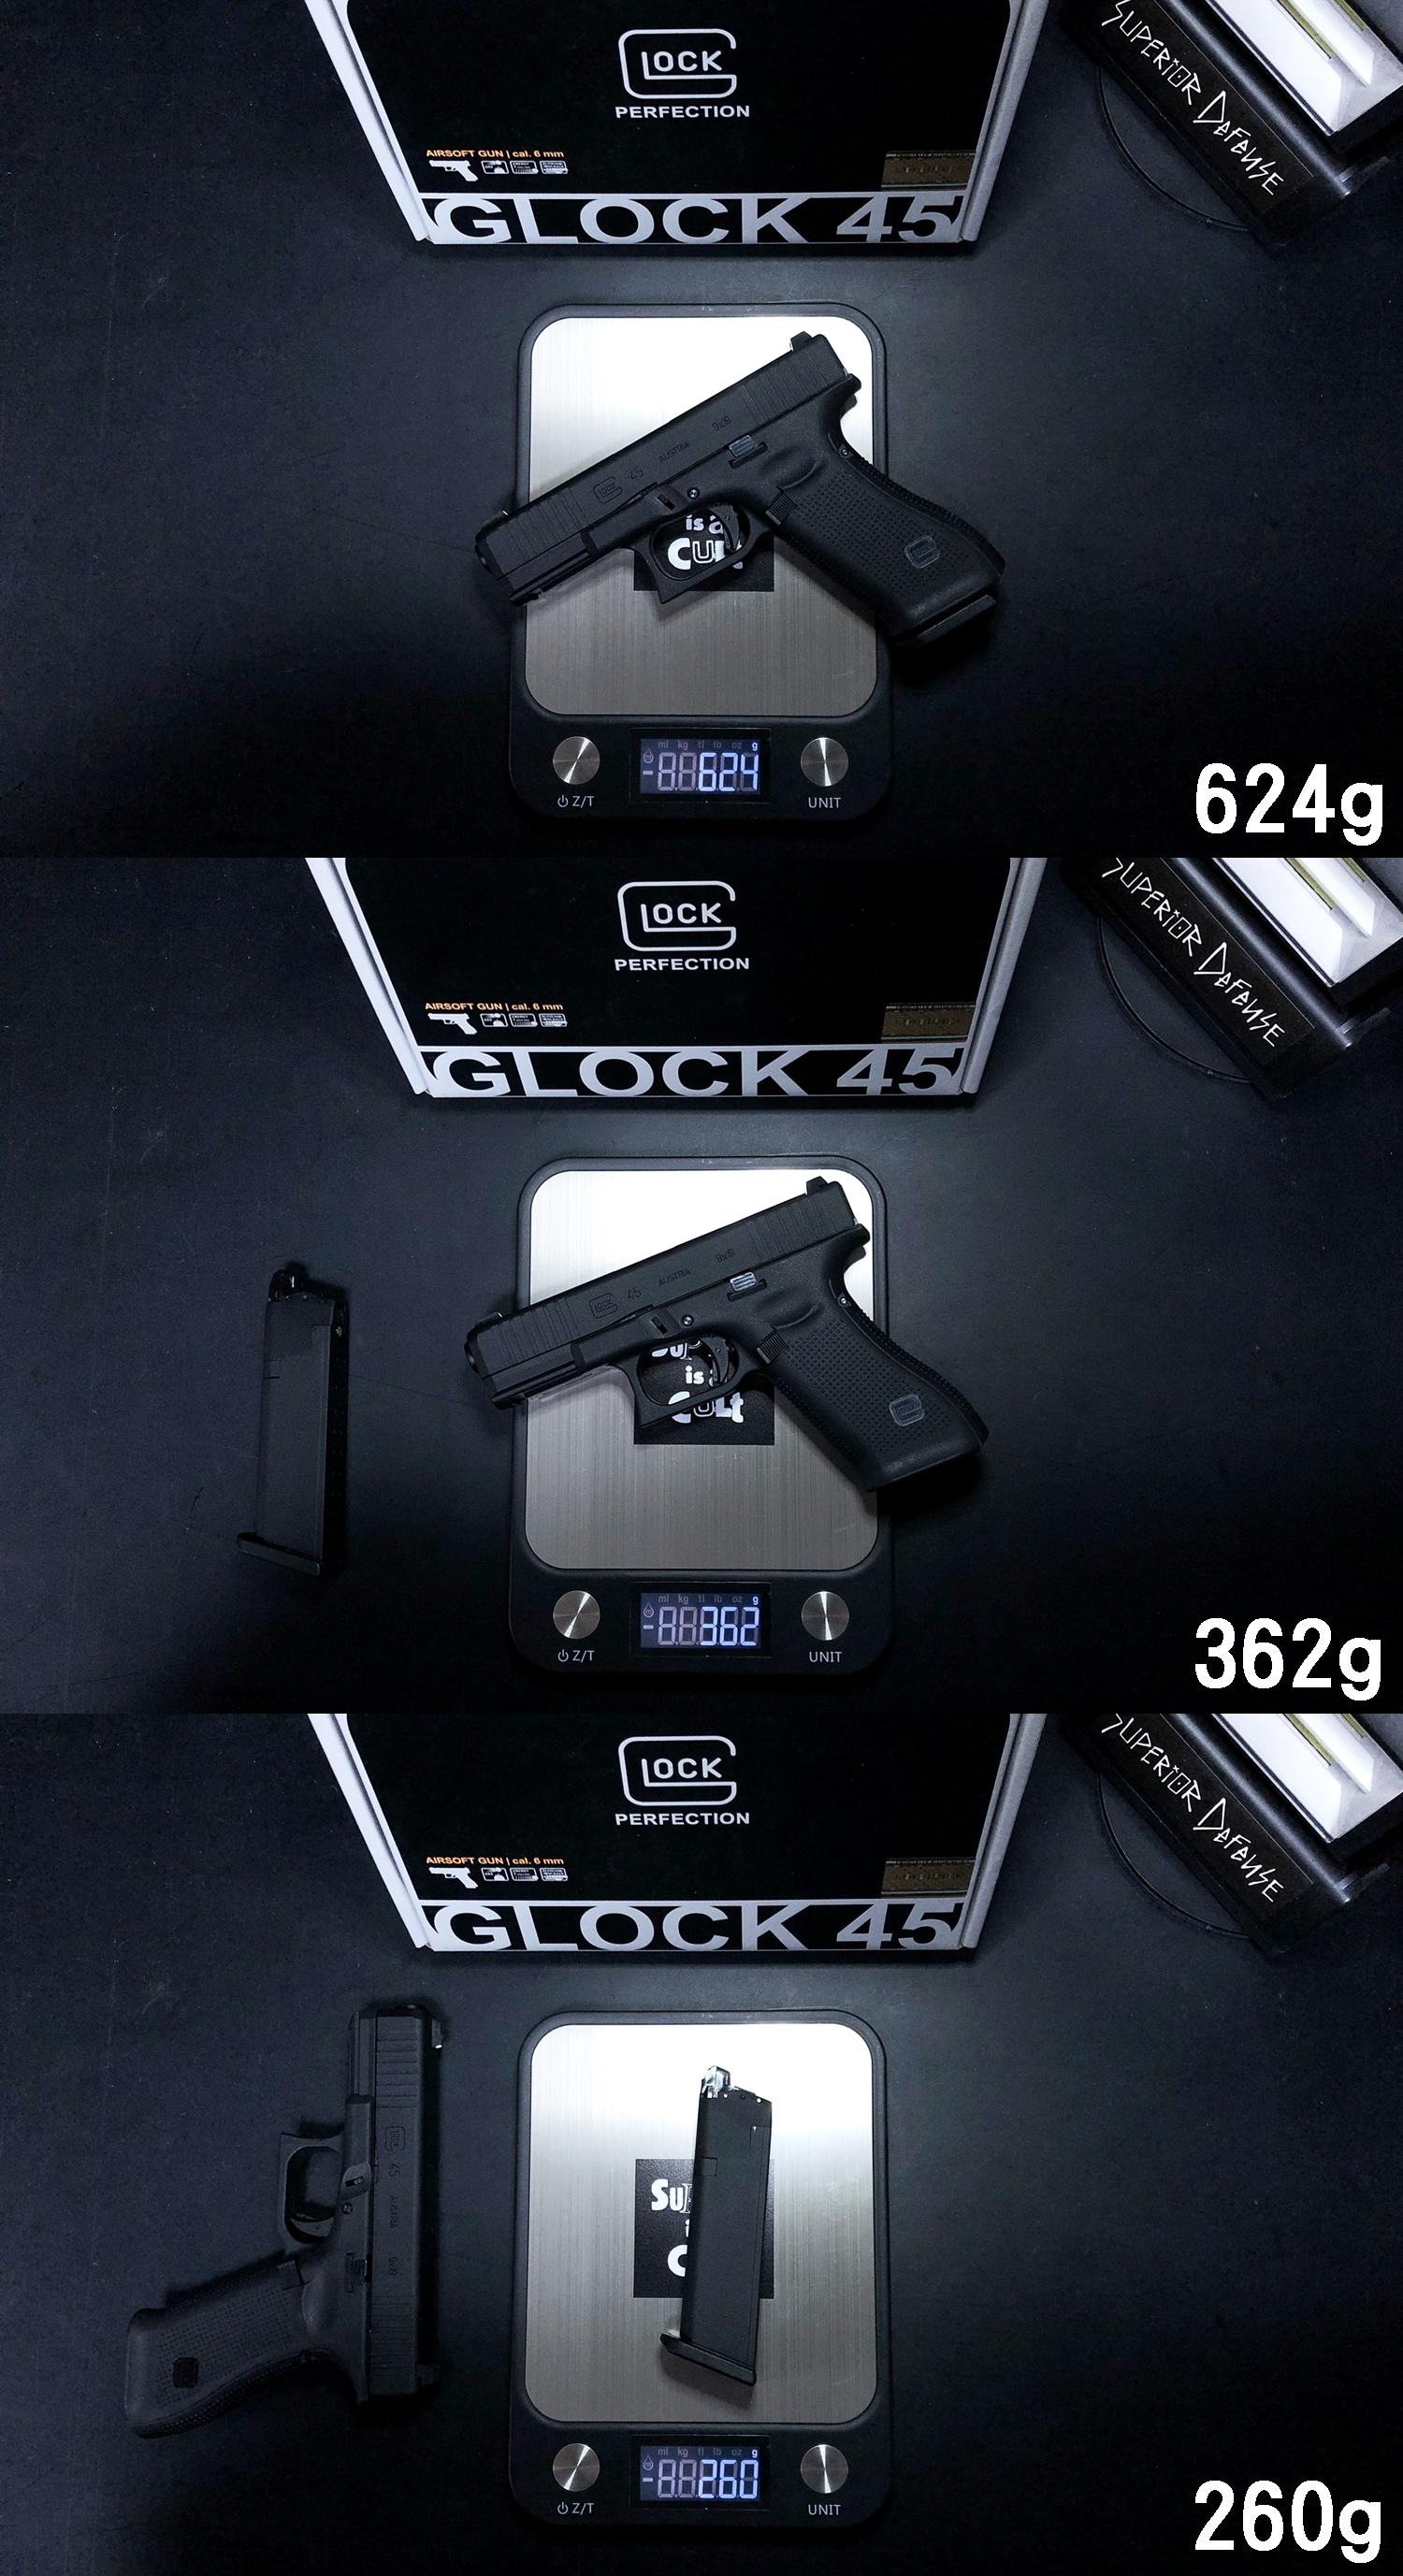 13 UMAREX VFC GLOCK G45 GBB AIRSOFT!! 噂のウマレックス G45 グロック ガスブローバック!! やっと我が家へ着弾 ~ 新品箱出し編!! 購入 開封 初速 計測 検証 比較 通常分解 組立 カスタム レビュー!!